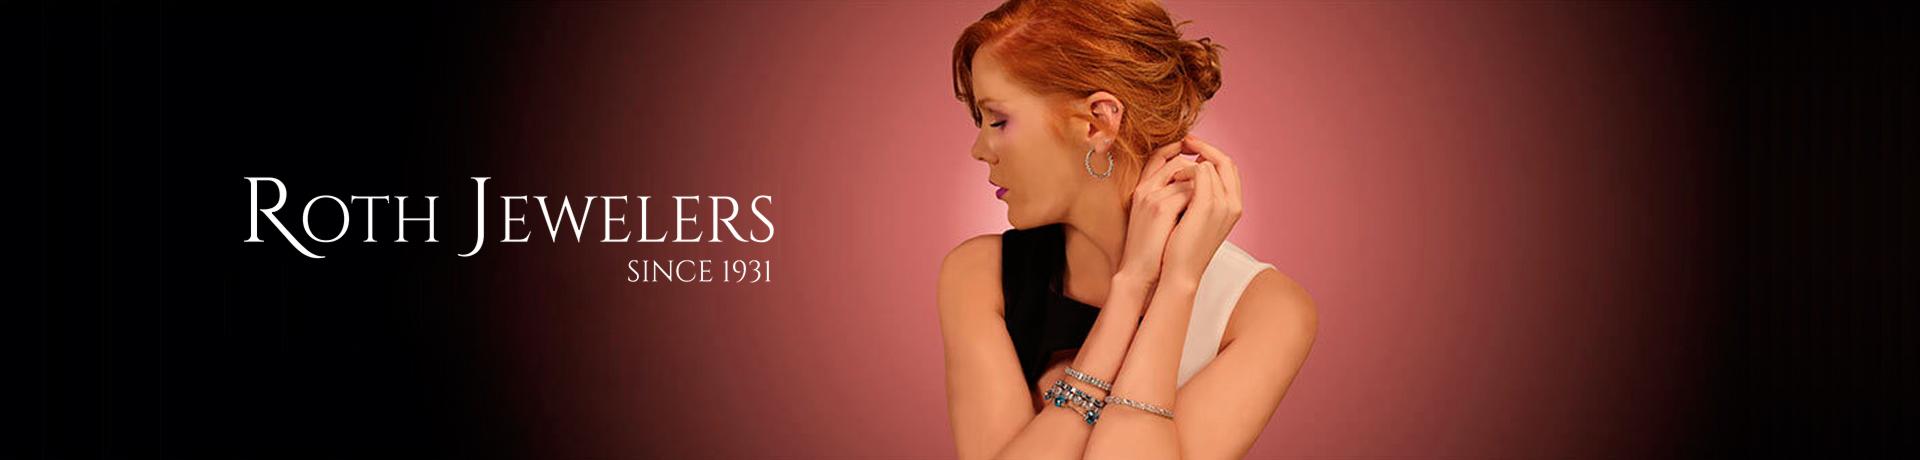 Roth Jewelers